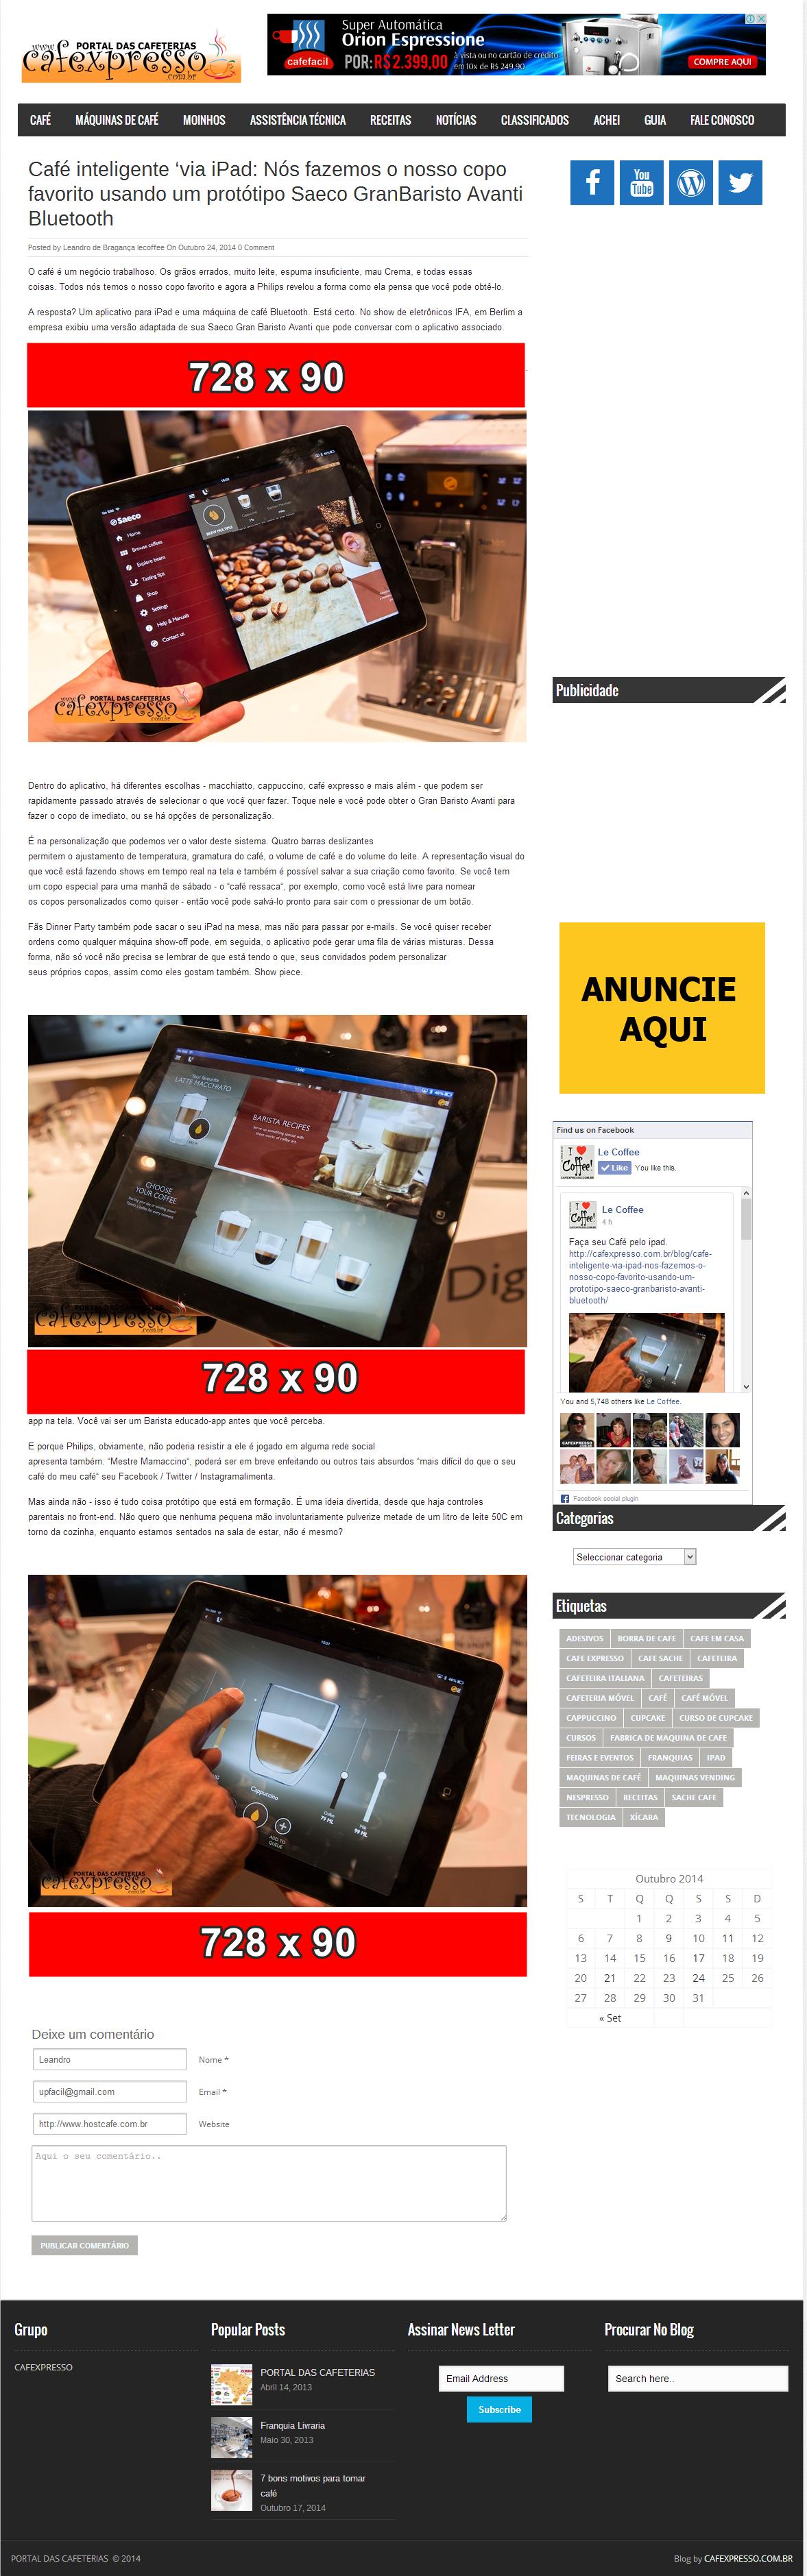 blog-publicidade-midiakit-interna3